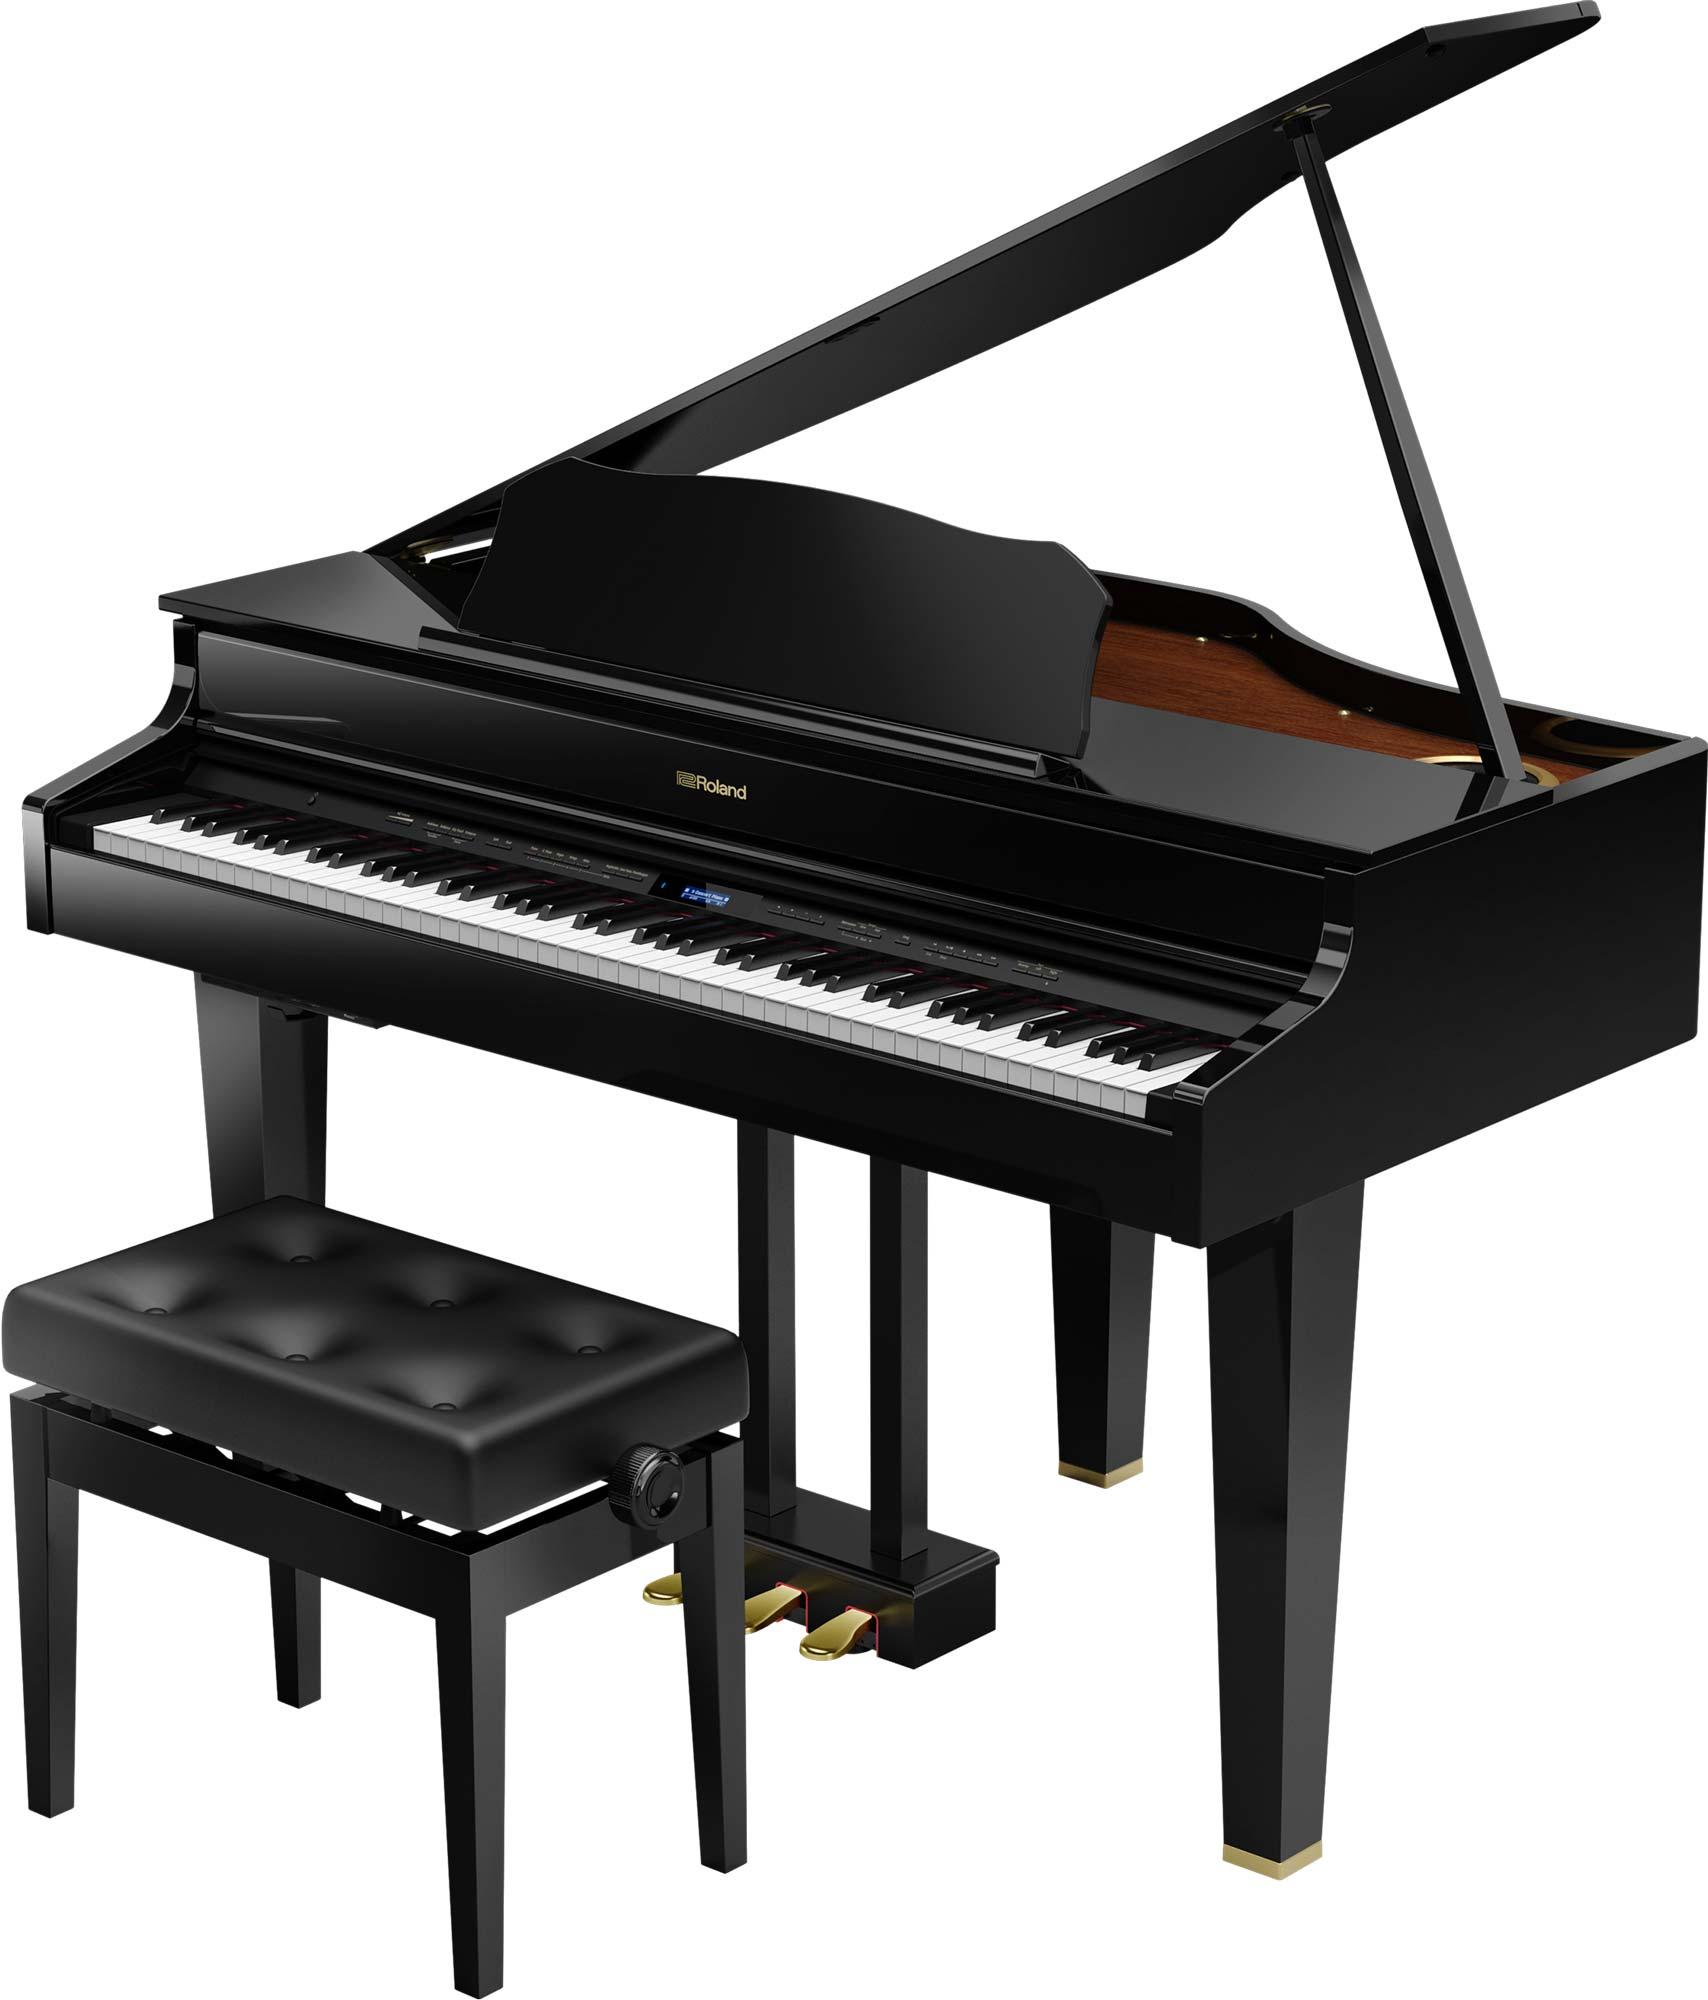 roland gp607 digital piano. Black Bedroom Furniture Sets. Home Design Ideas